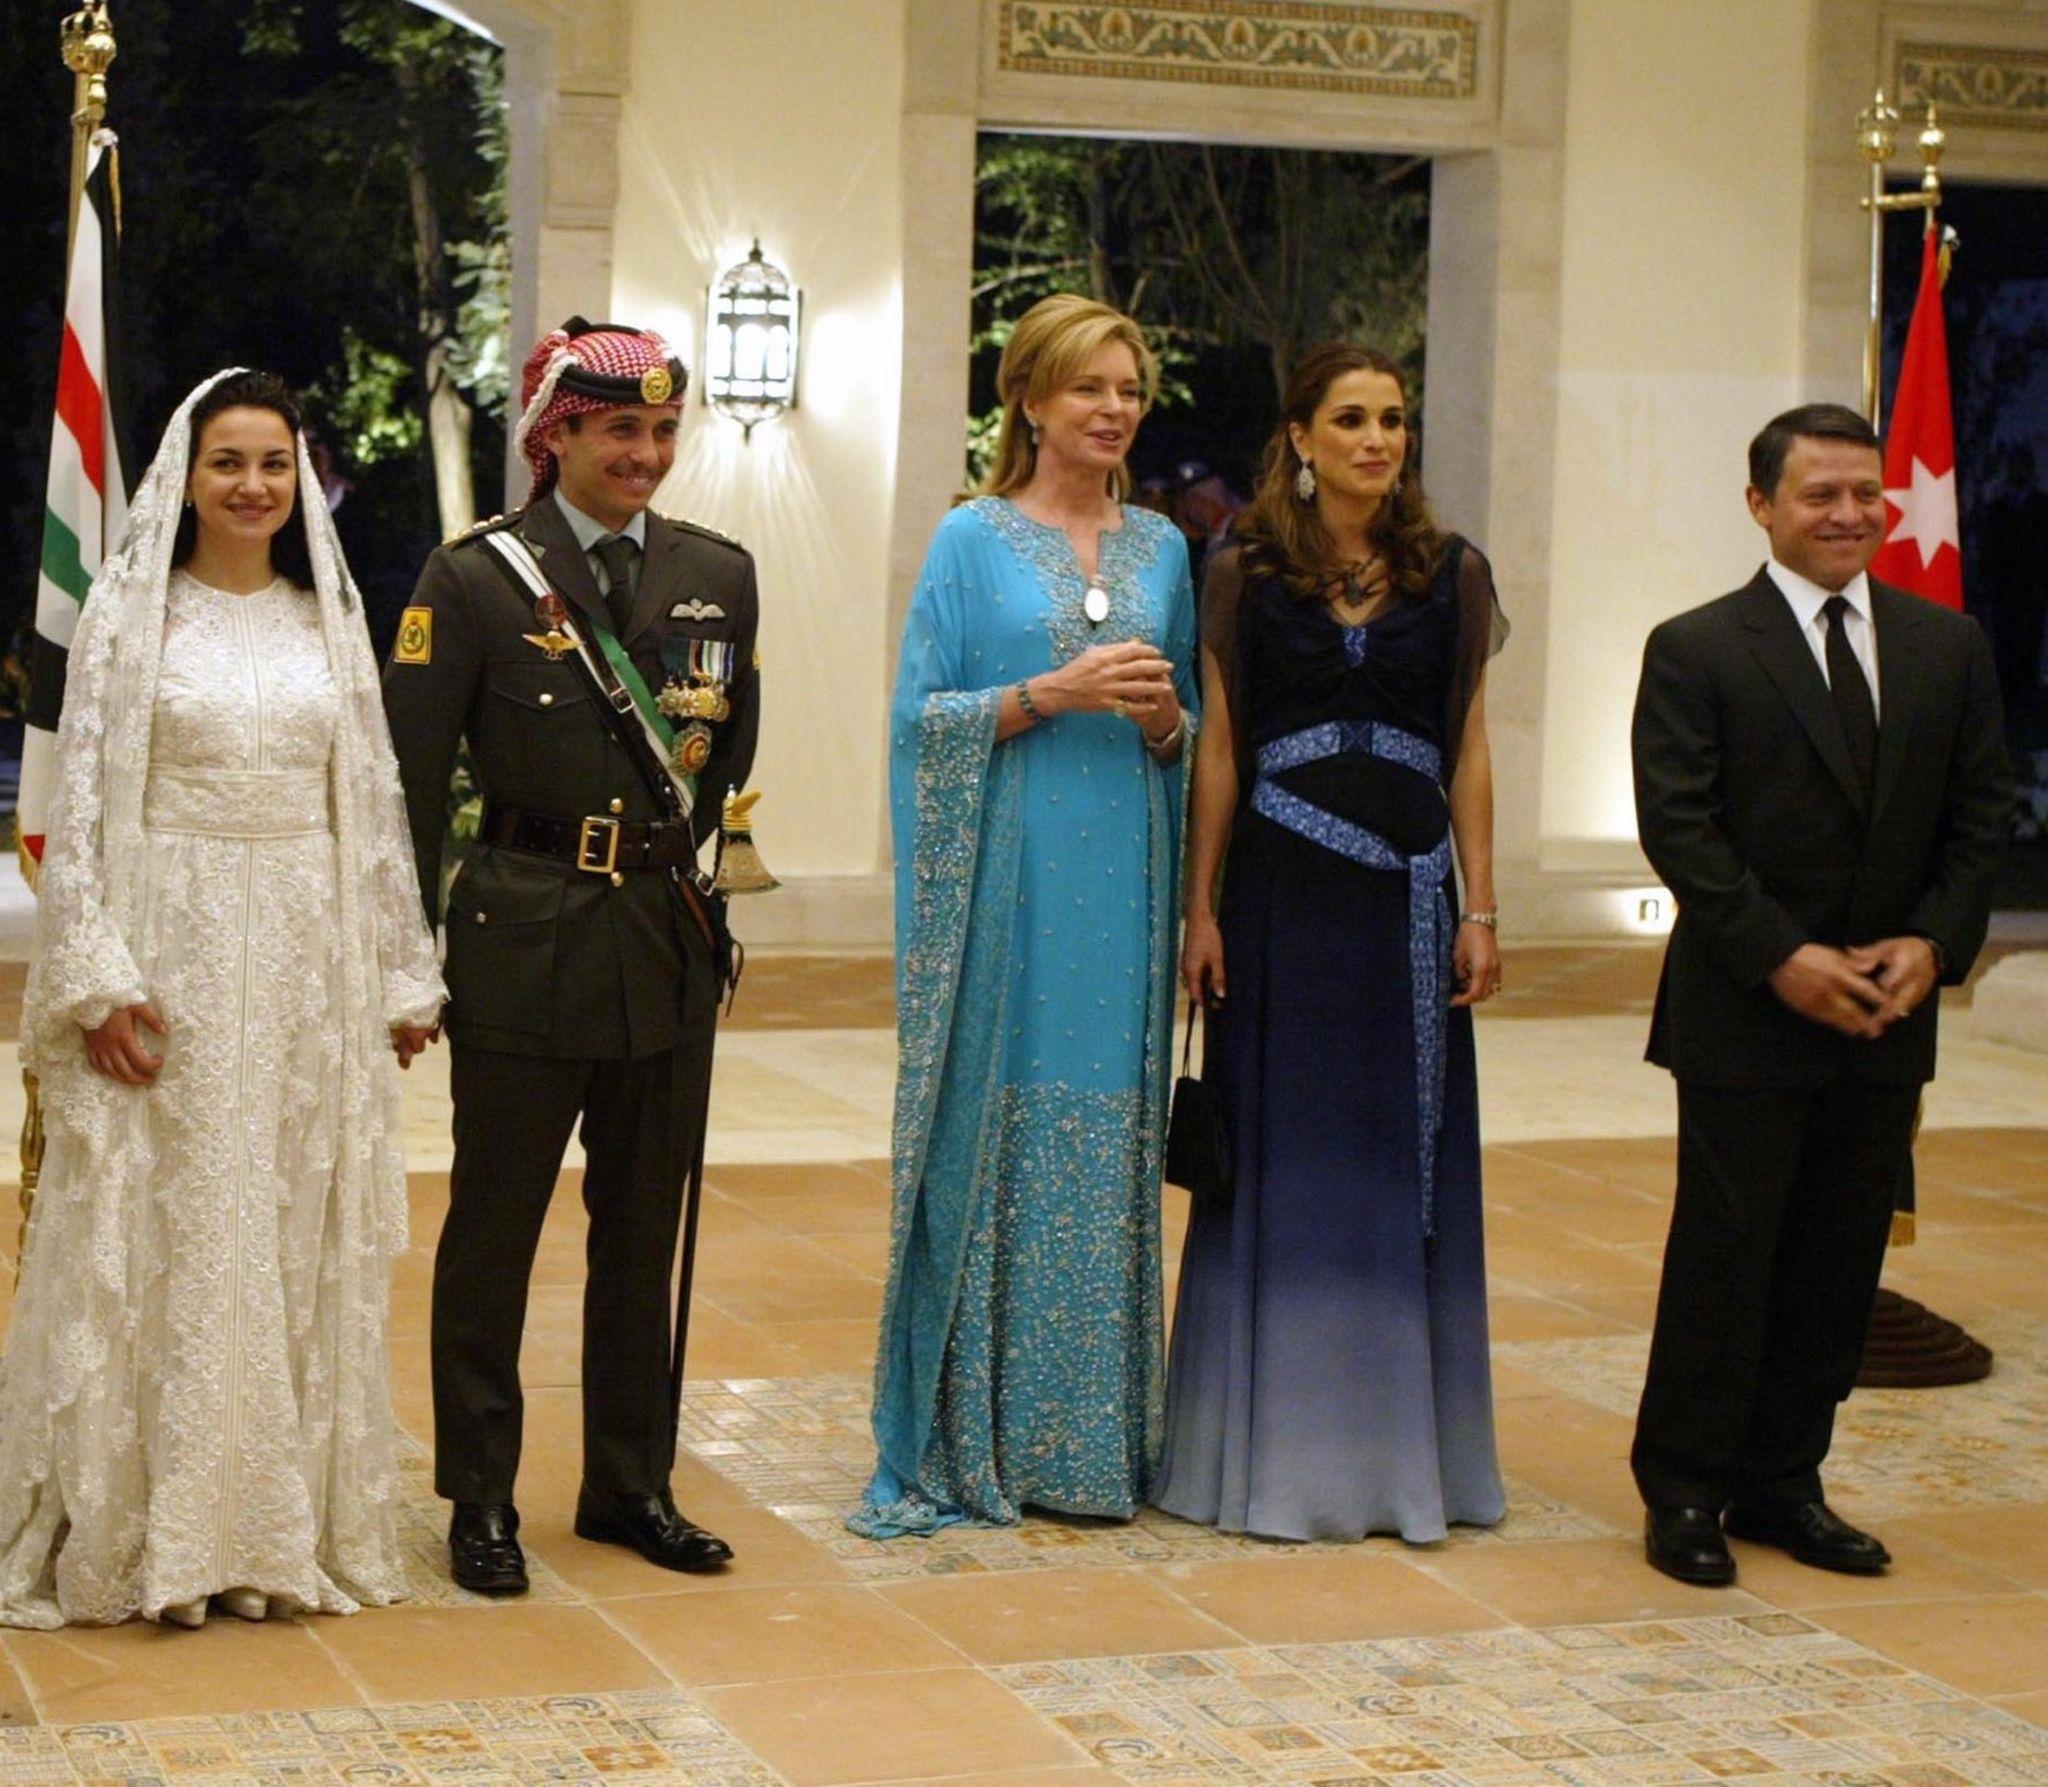 Jordan's King Abdullah II, his wife Queen Rania, Queen Noor, mother of the groom, Crown Prince Hamzeh, the groom, his bride Princess Noor, Sherif Asem bin-Nayef and his ex-wife Firouzeh Vokhshouri, parents of the bride, attend the royal wedding on May 27, 2004 in Amman, Jordan